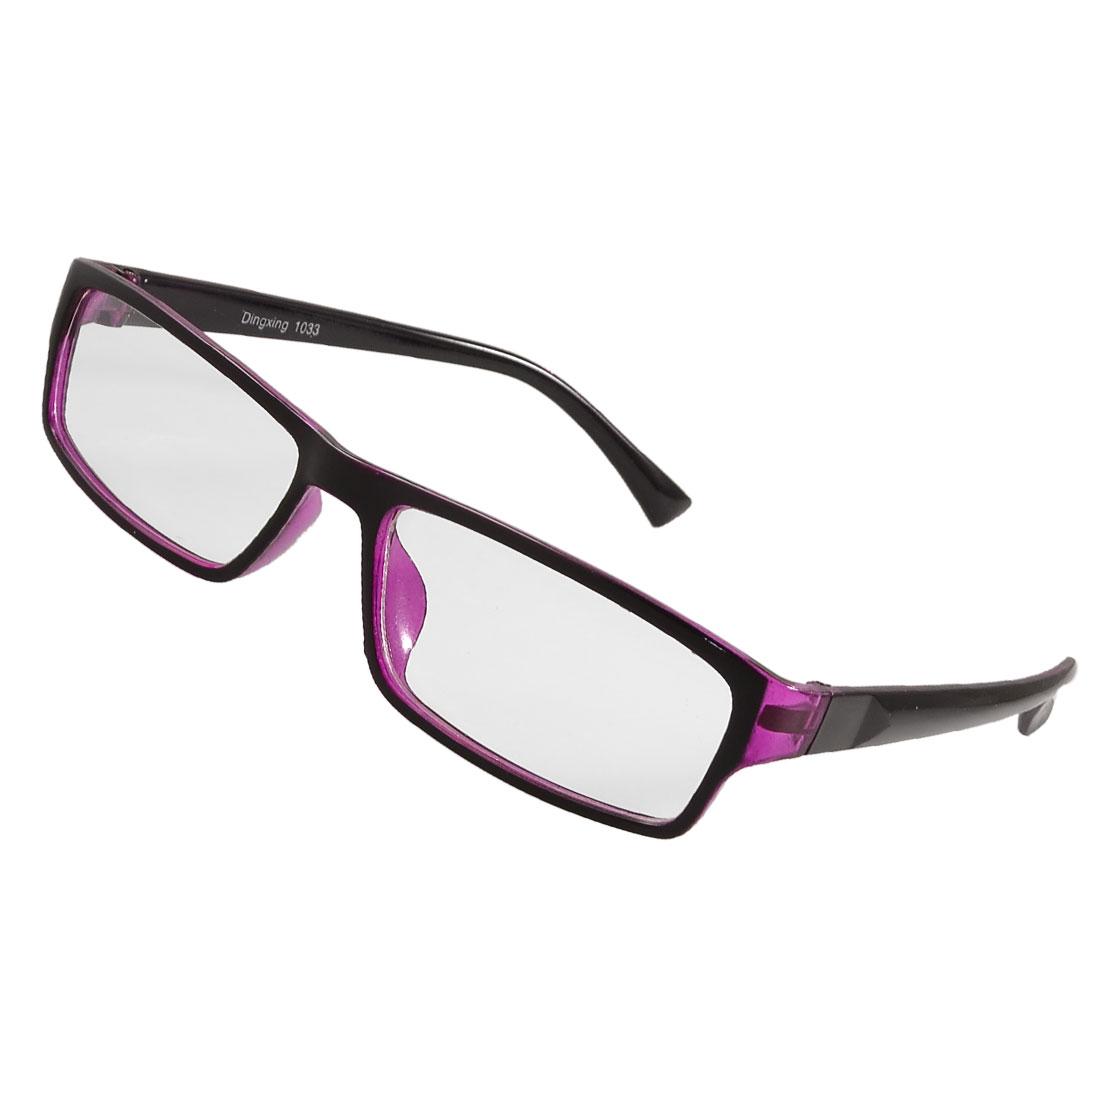 Woman Purple Black Rim Rectangle Lens Plano Eyeglasses Glasses